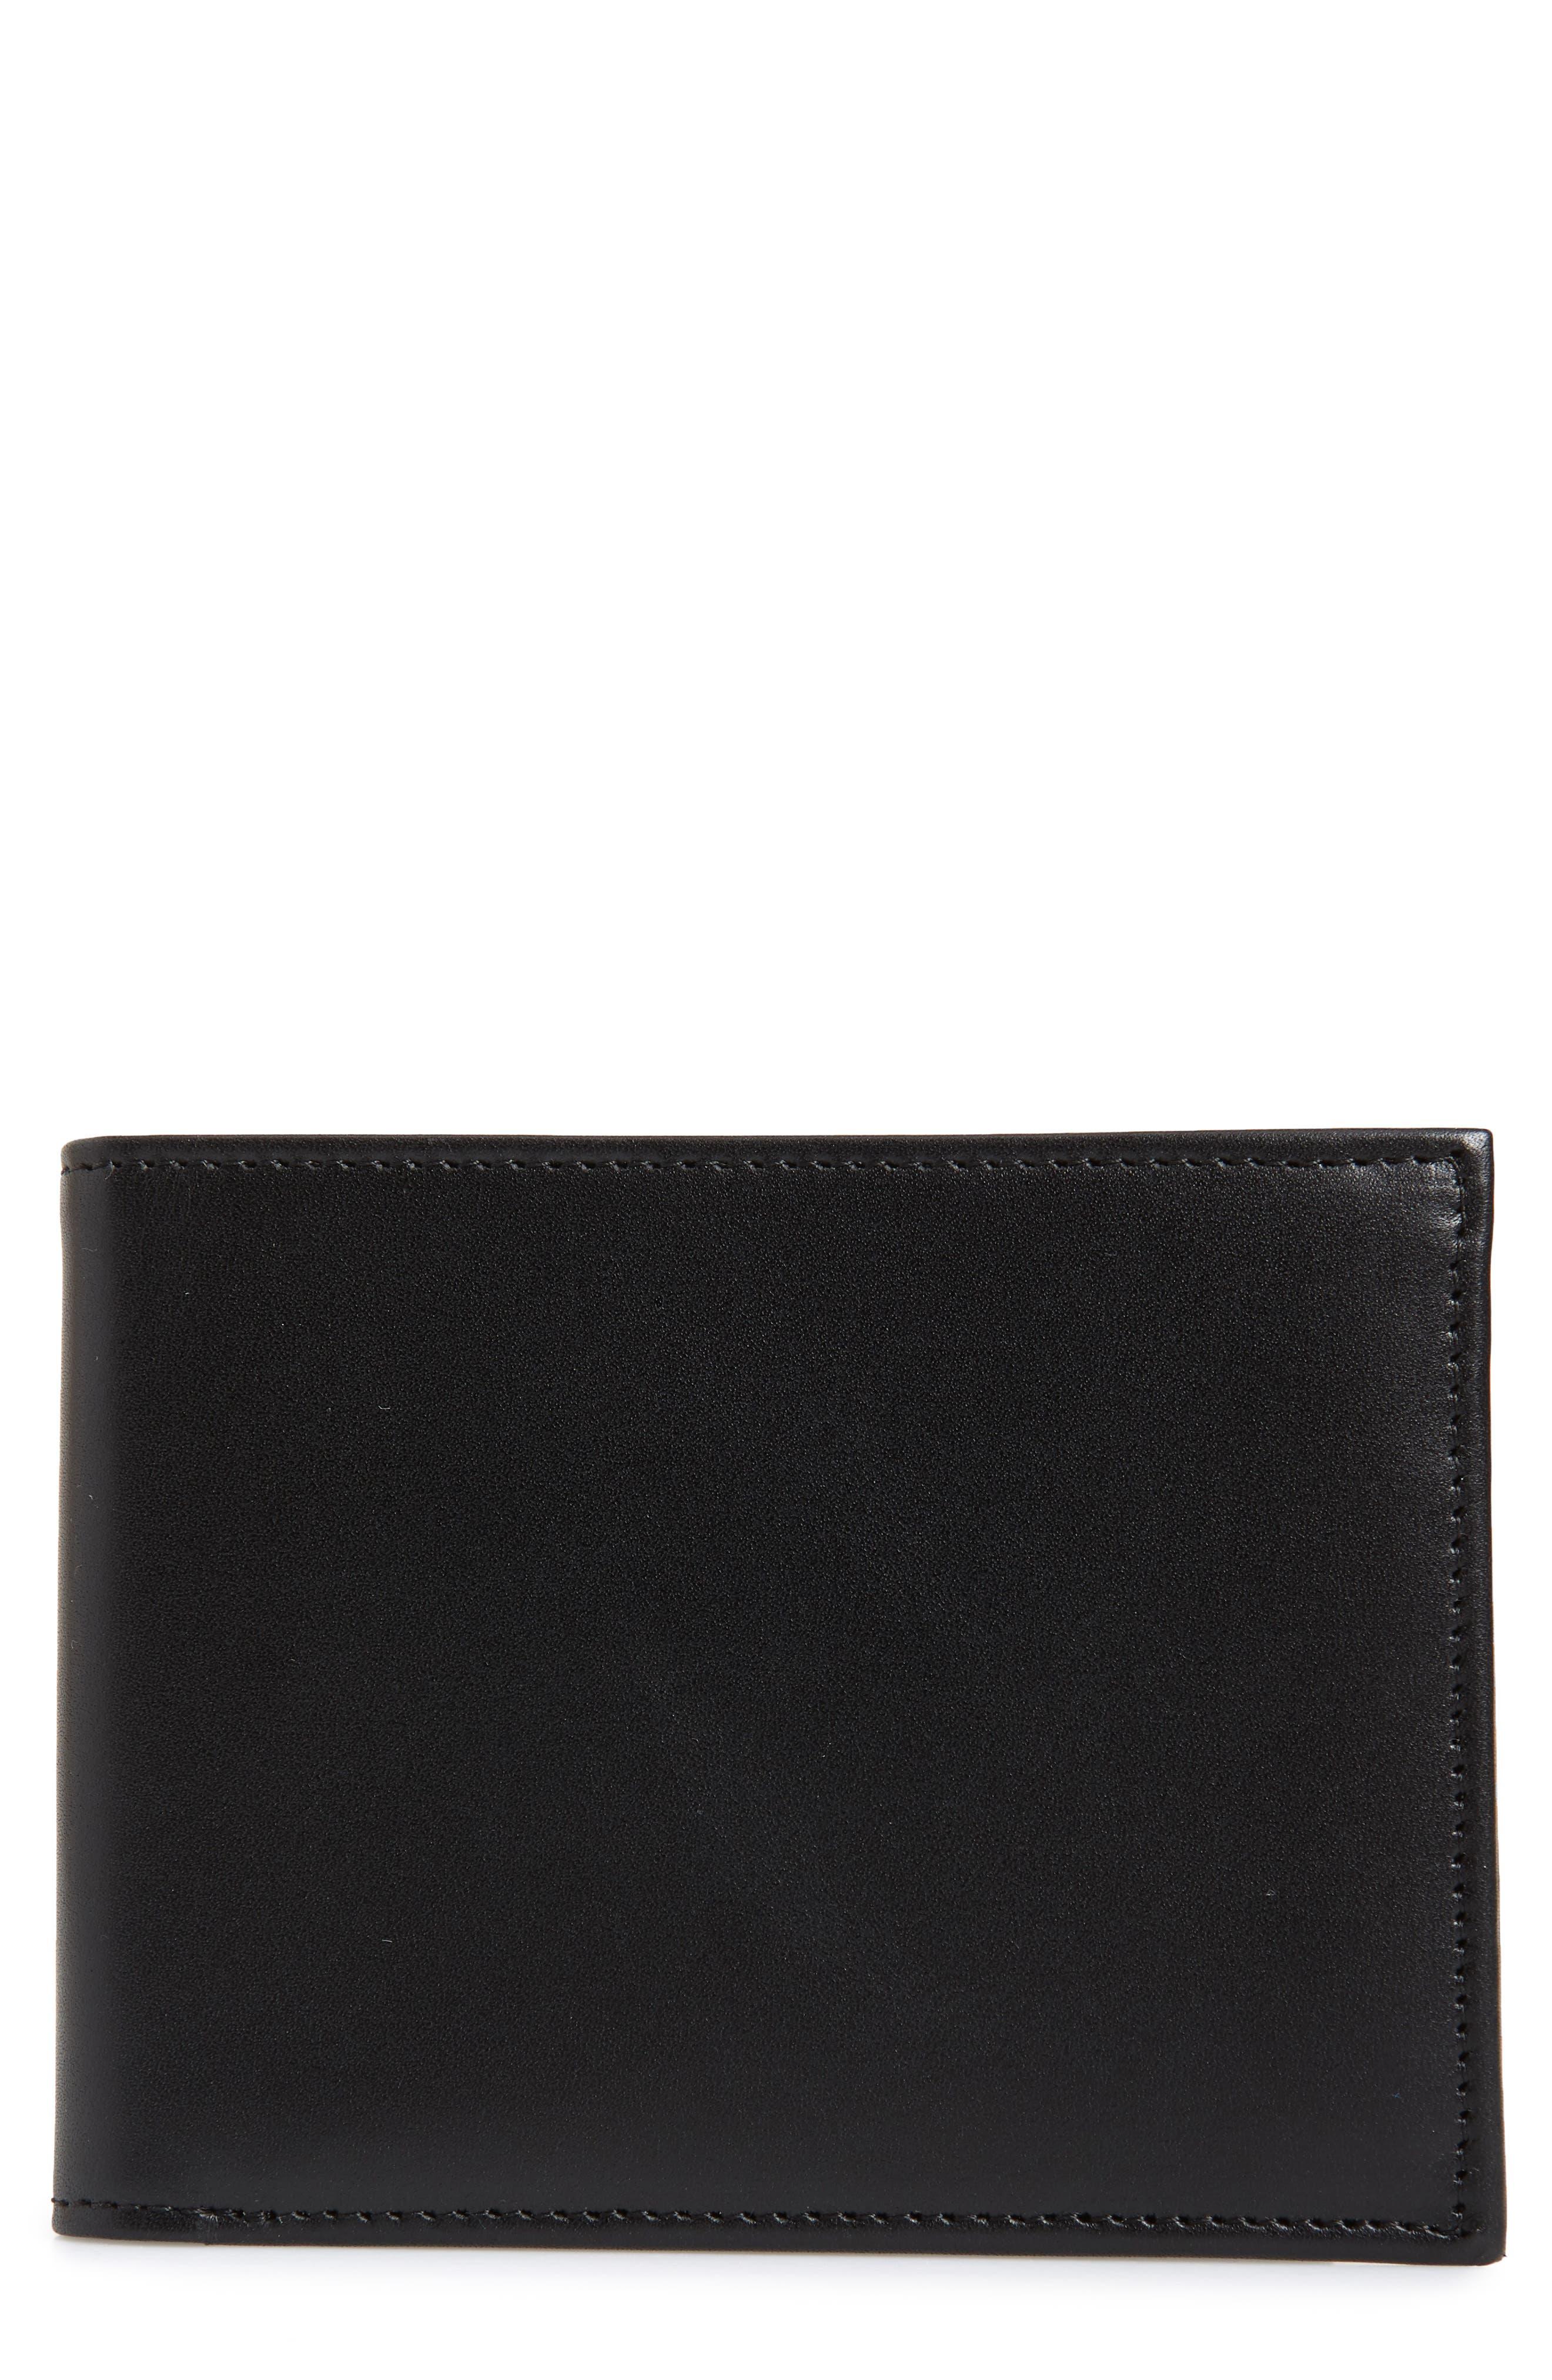 Chelsea Leather Wallet,                             Main thumbnail 1, color,                             BLACK